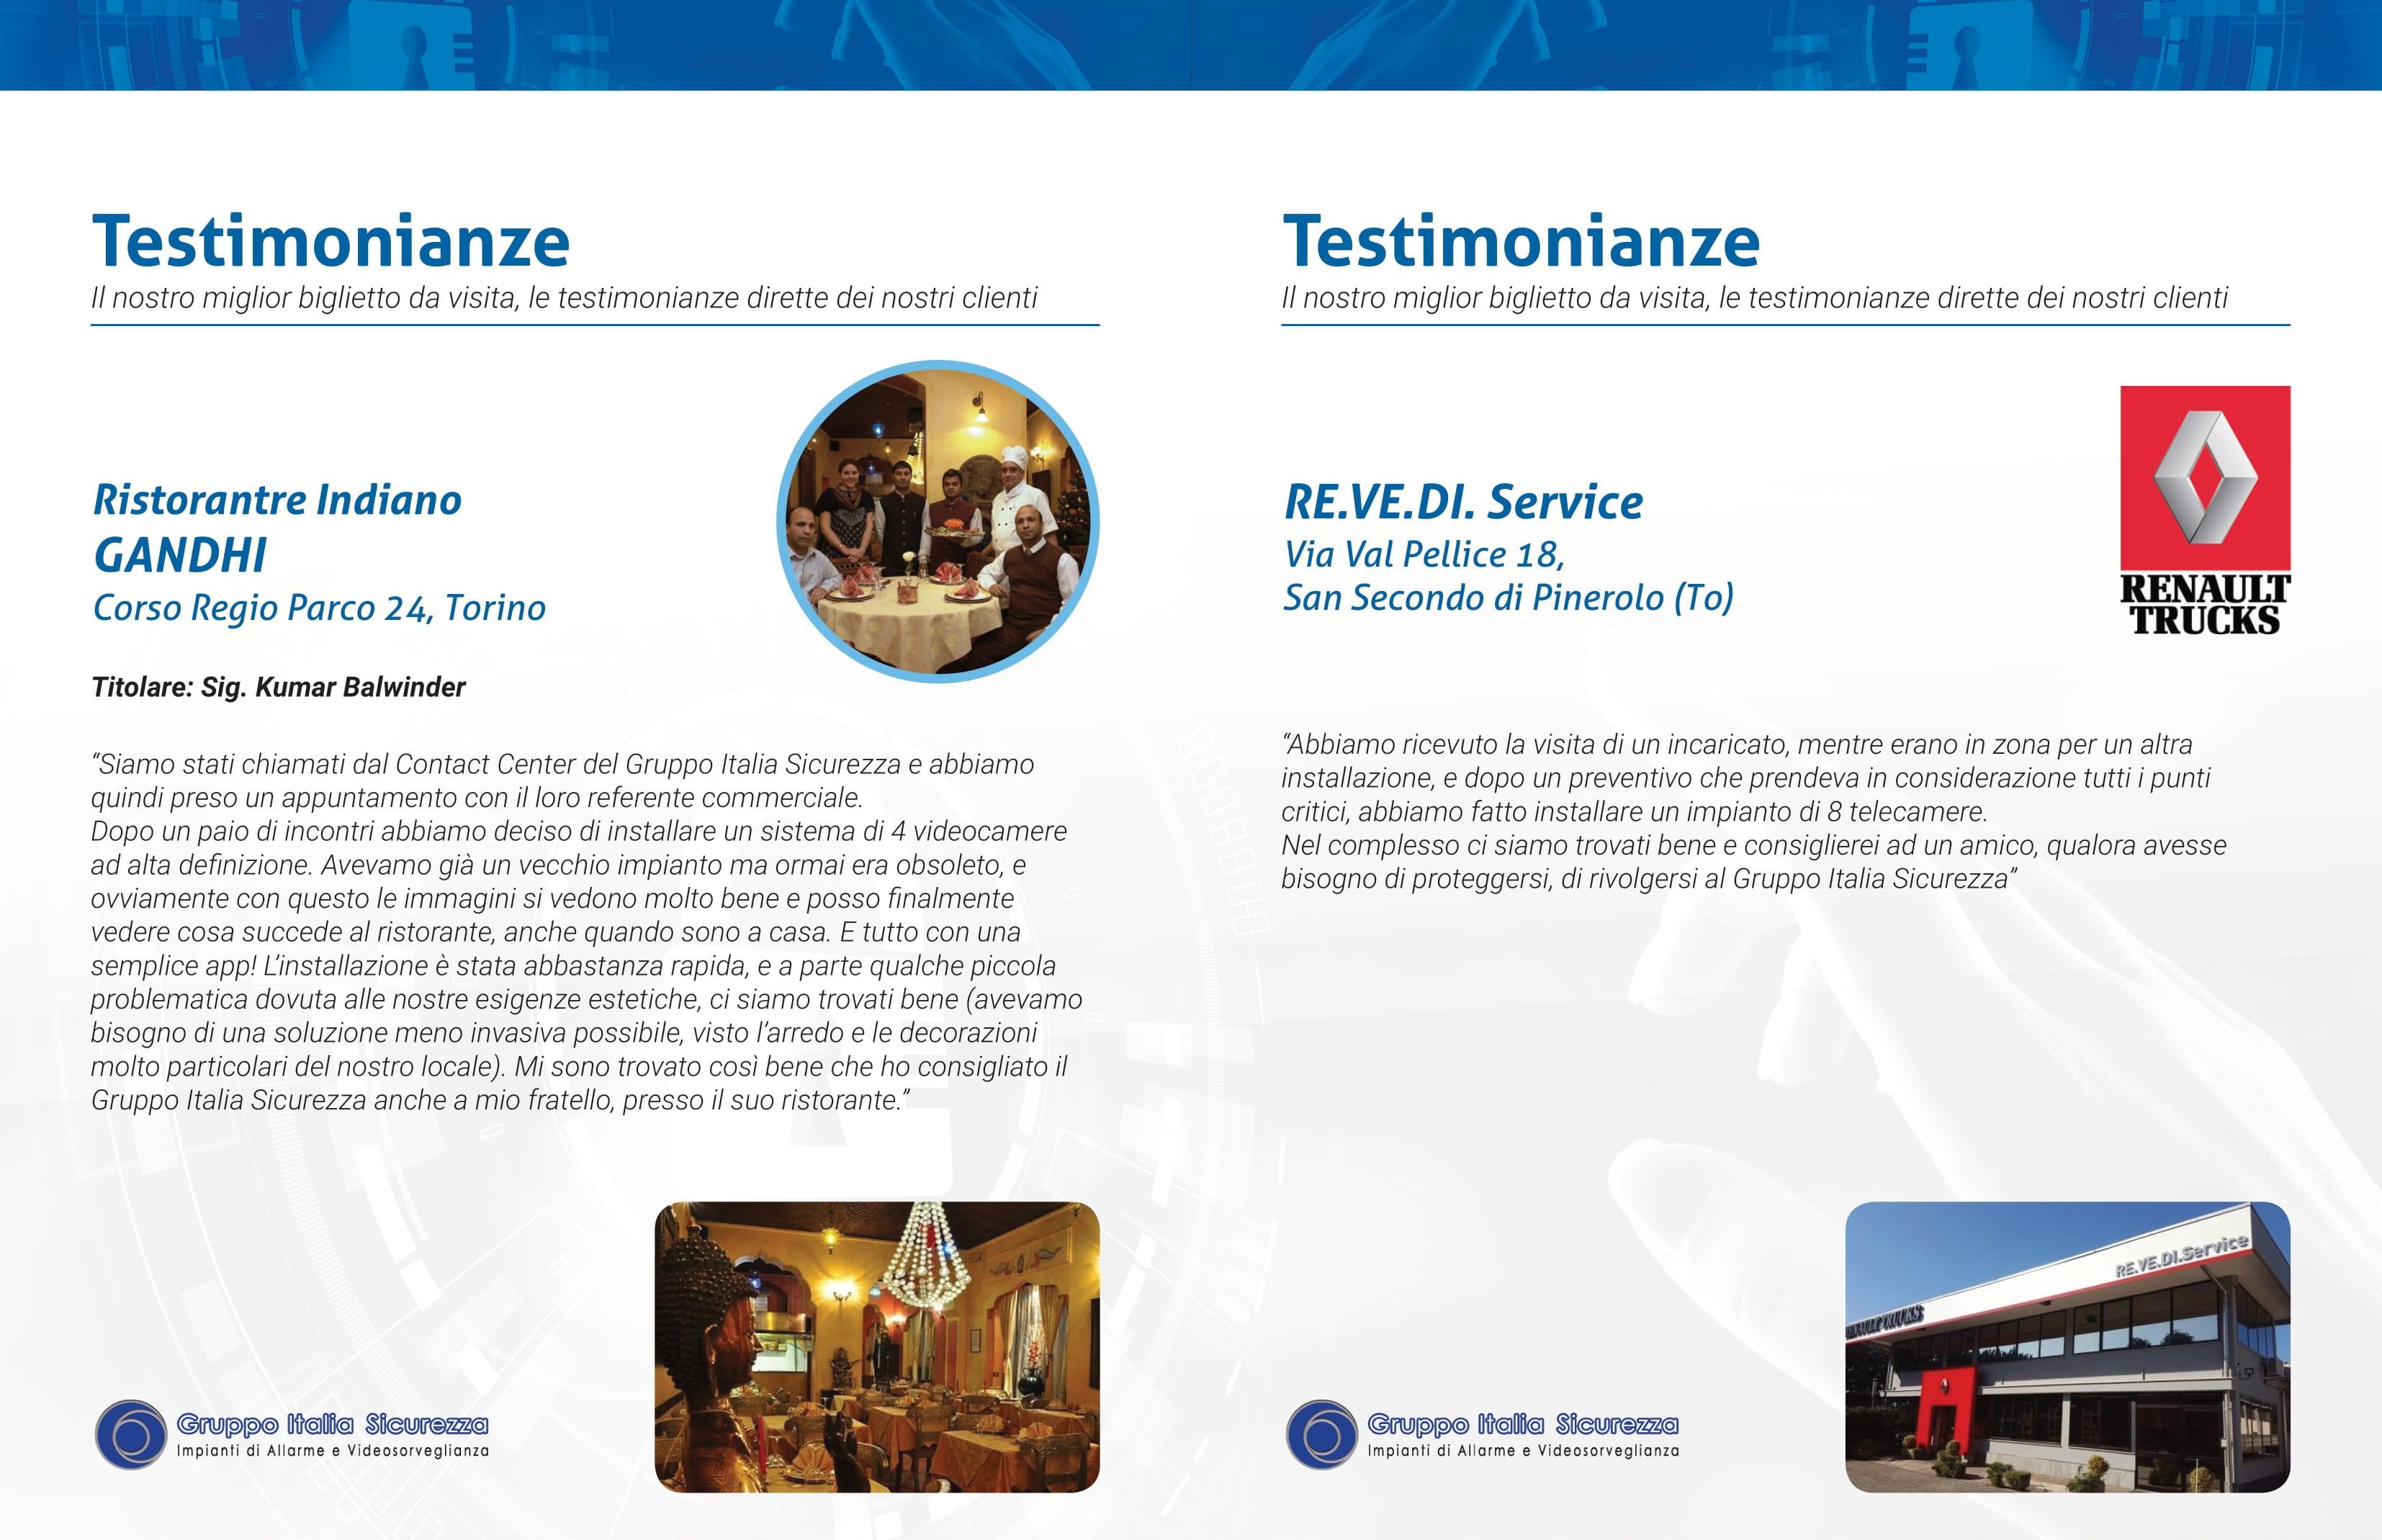 GIS-Catalogo-A4-LAST_011-011-1